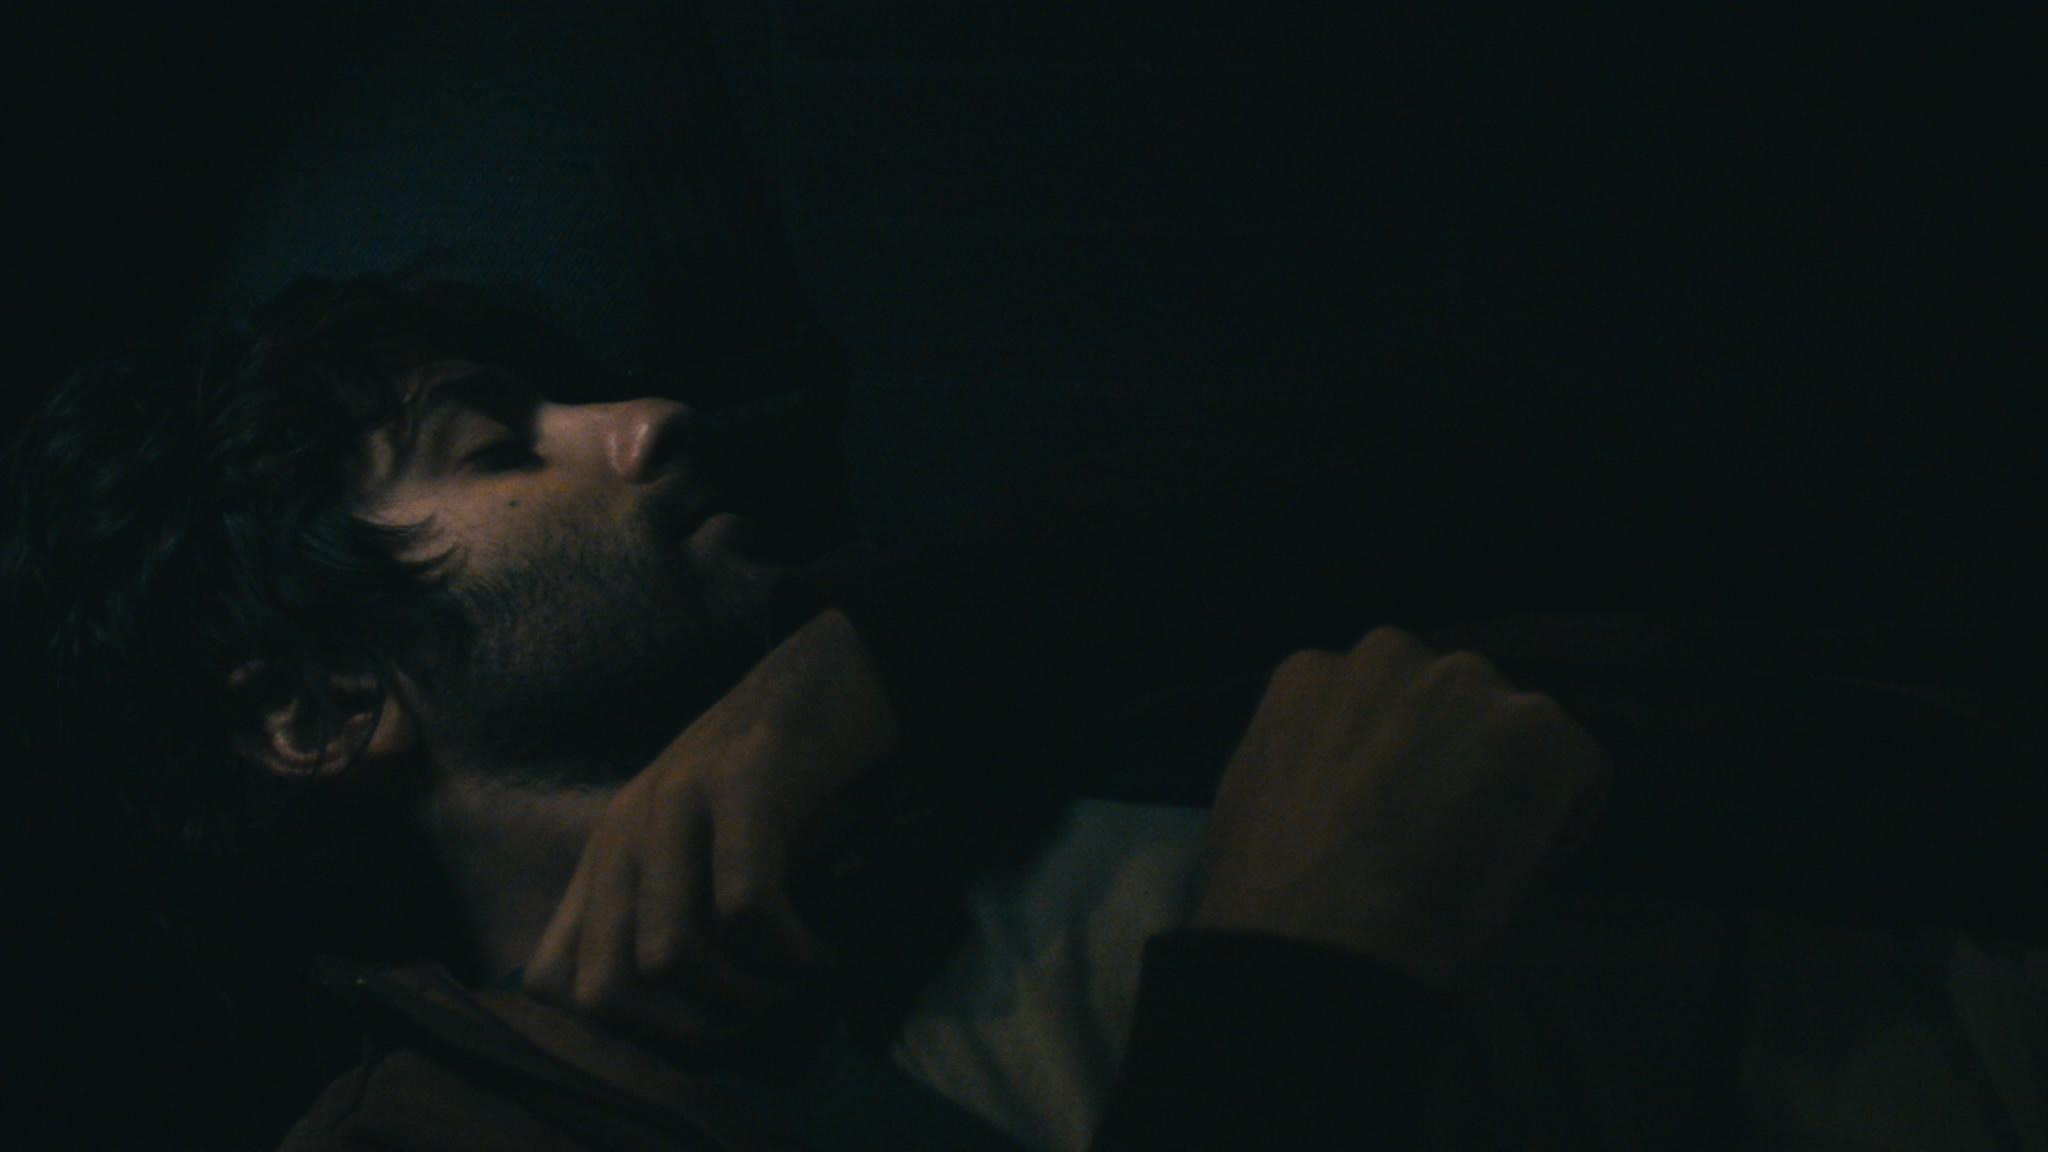 Hertzel sleeping